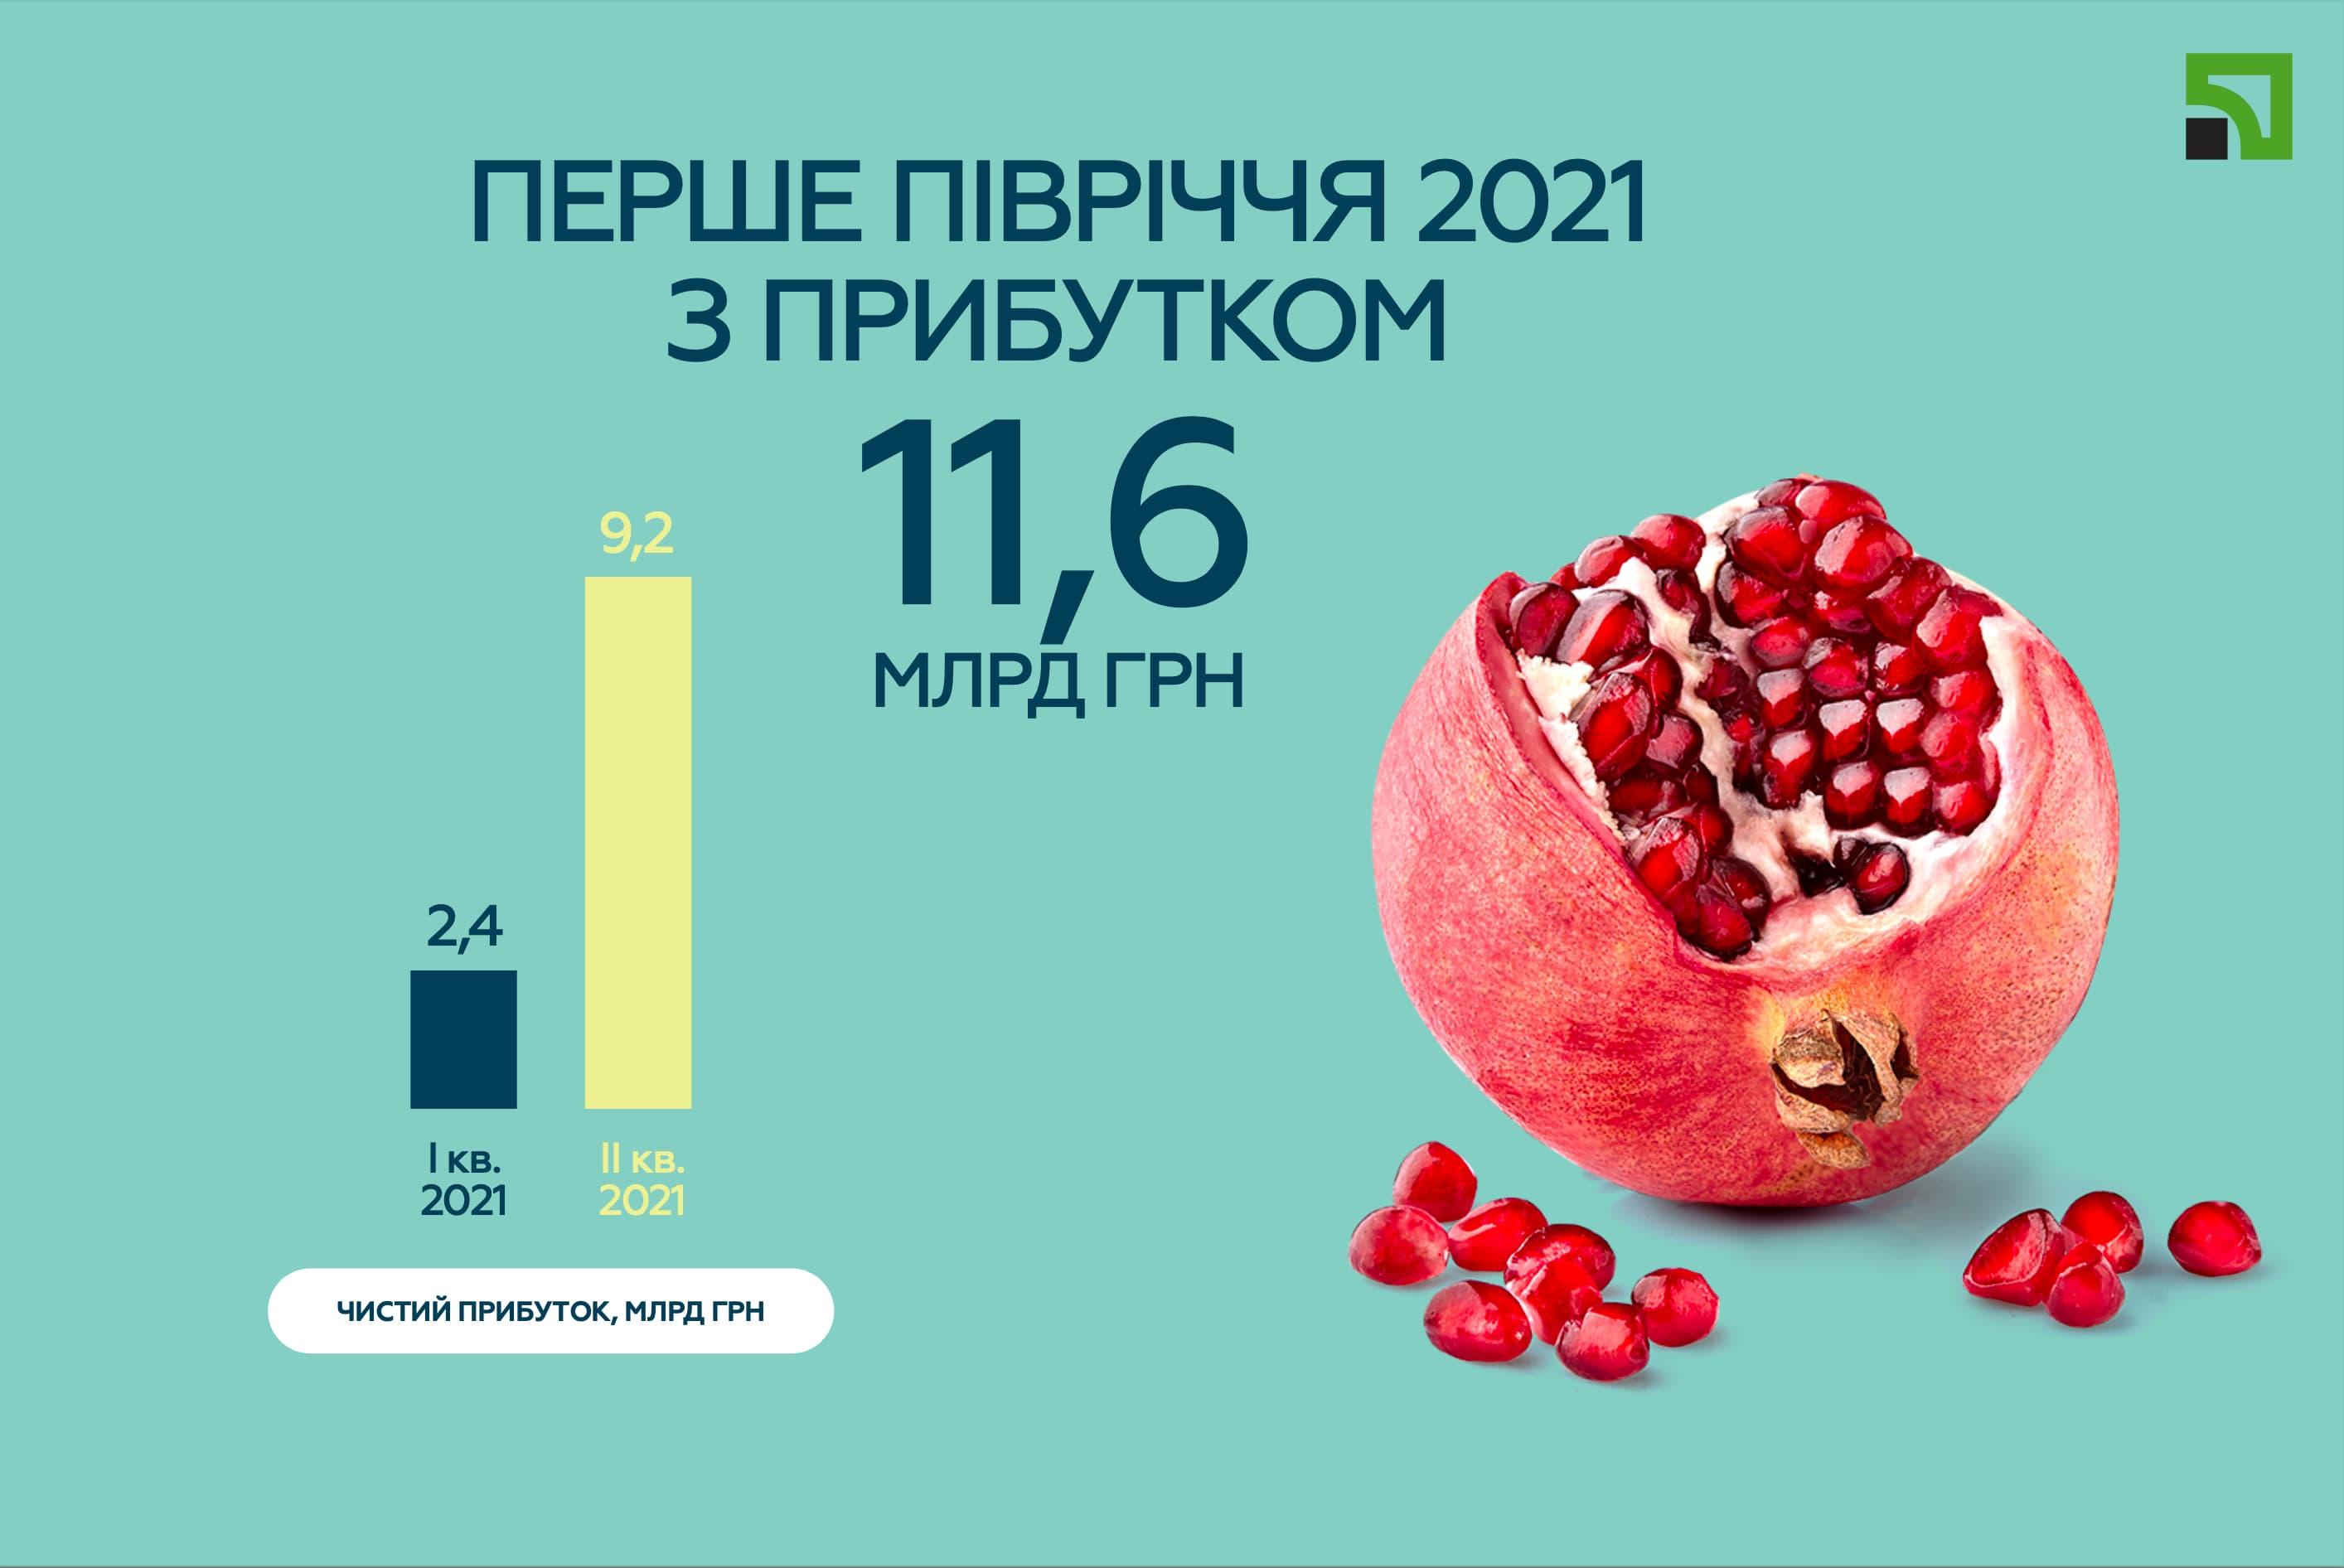 Прибуток ПриватБанку у другому кварталі 2021 року склав 9,2 млрд грн,